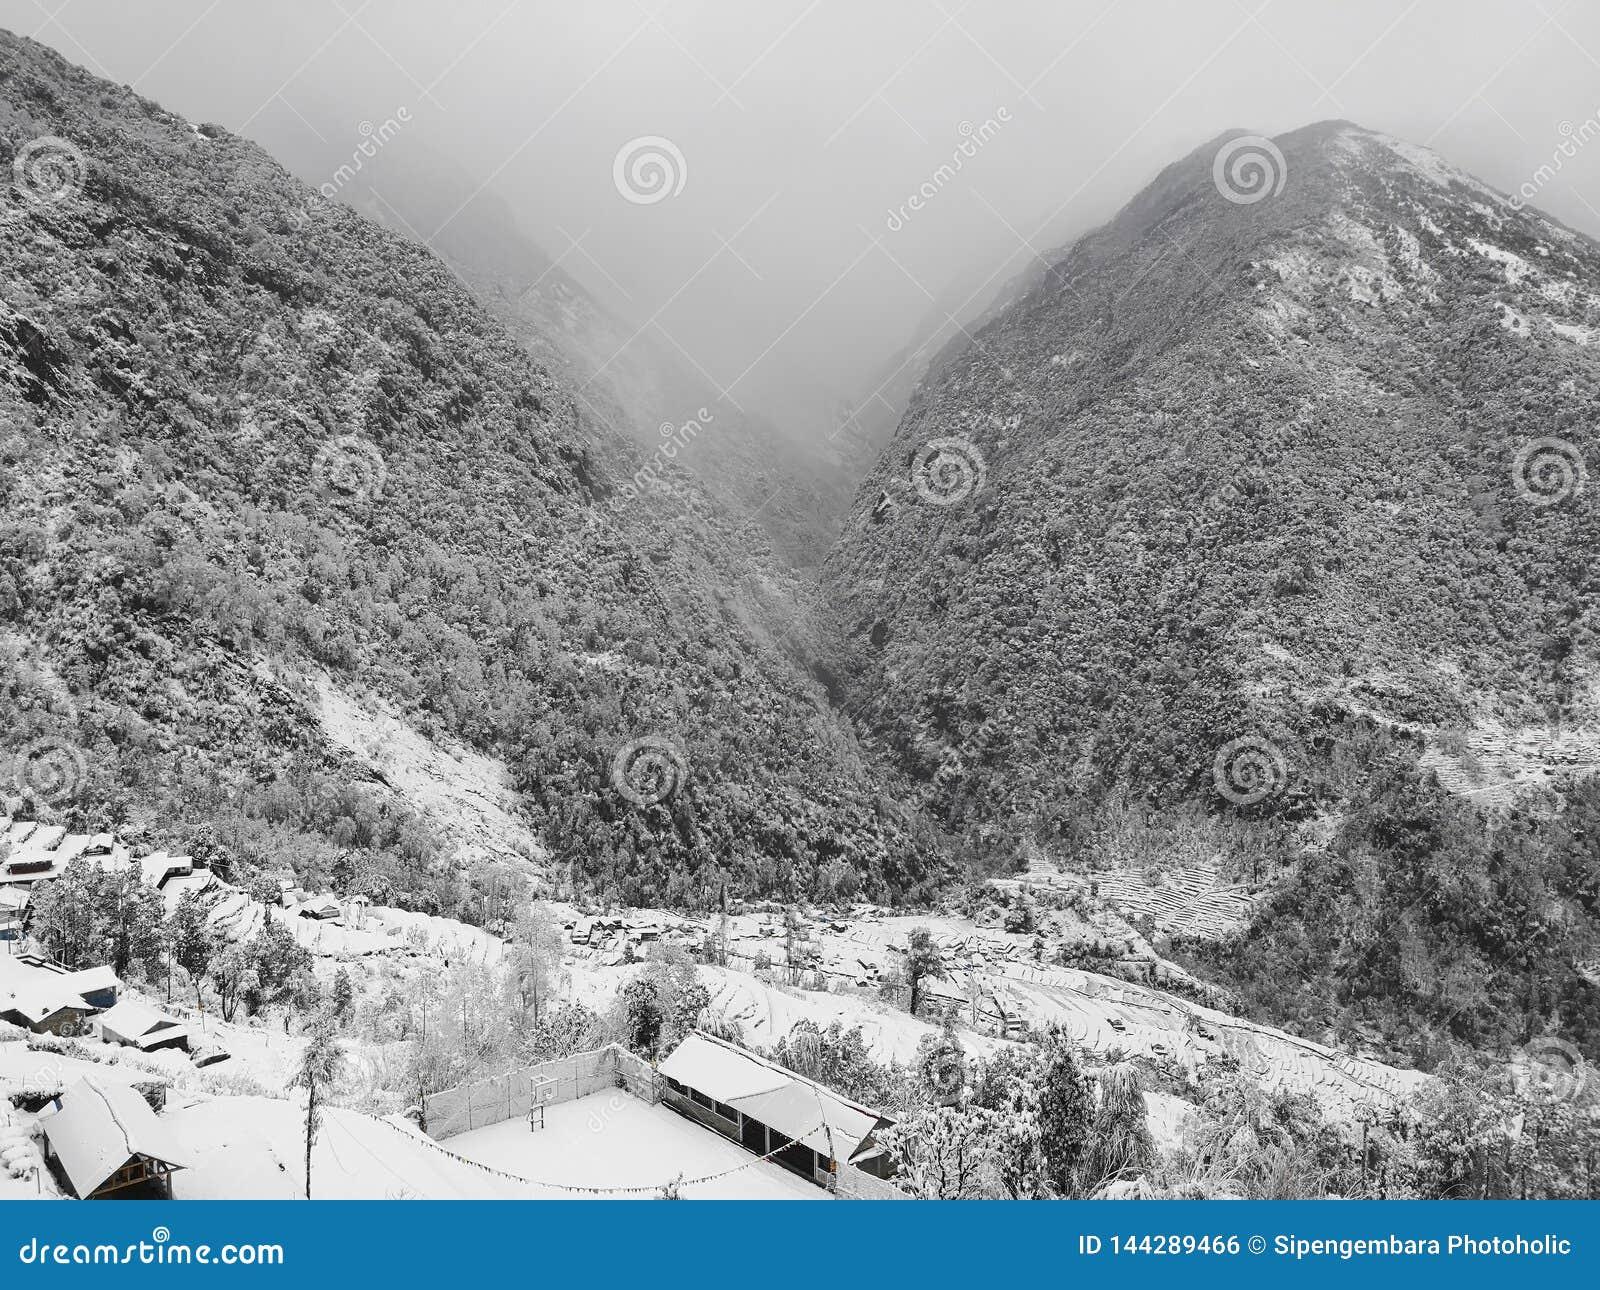 Зима на Annapurna южном, захватывающий взгляд от Kalpana